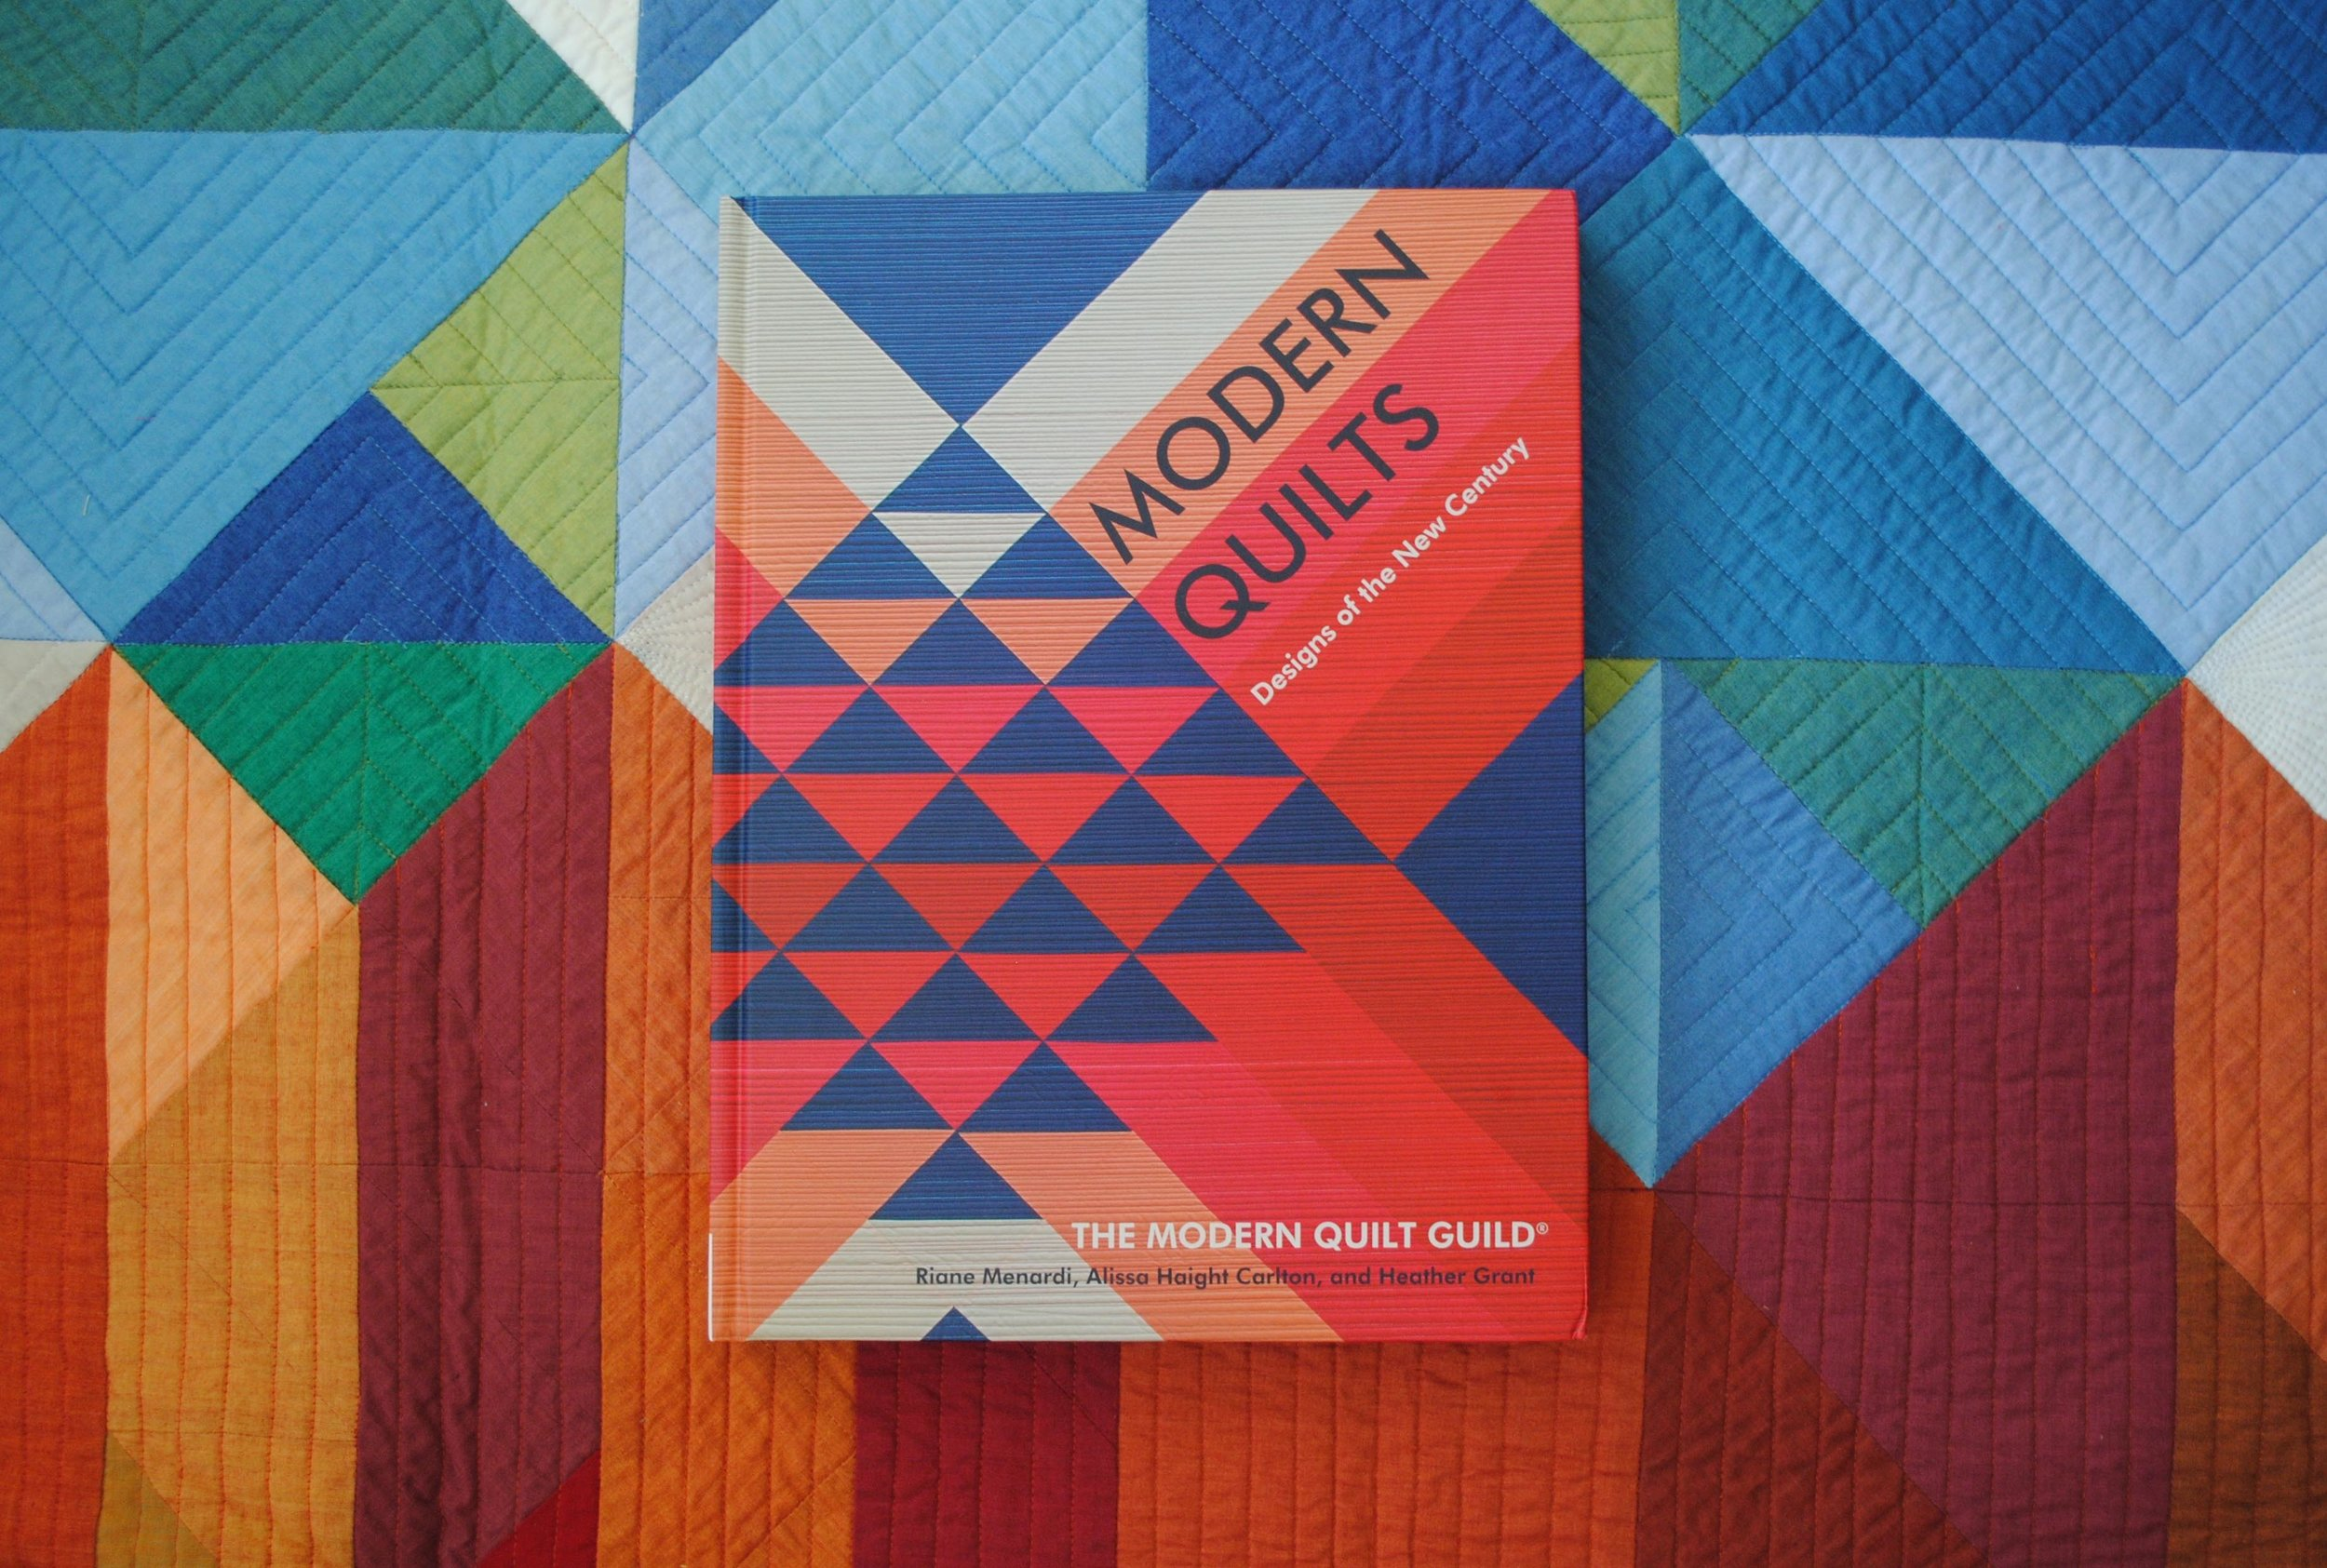 mq book cover full.jpg